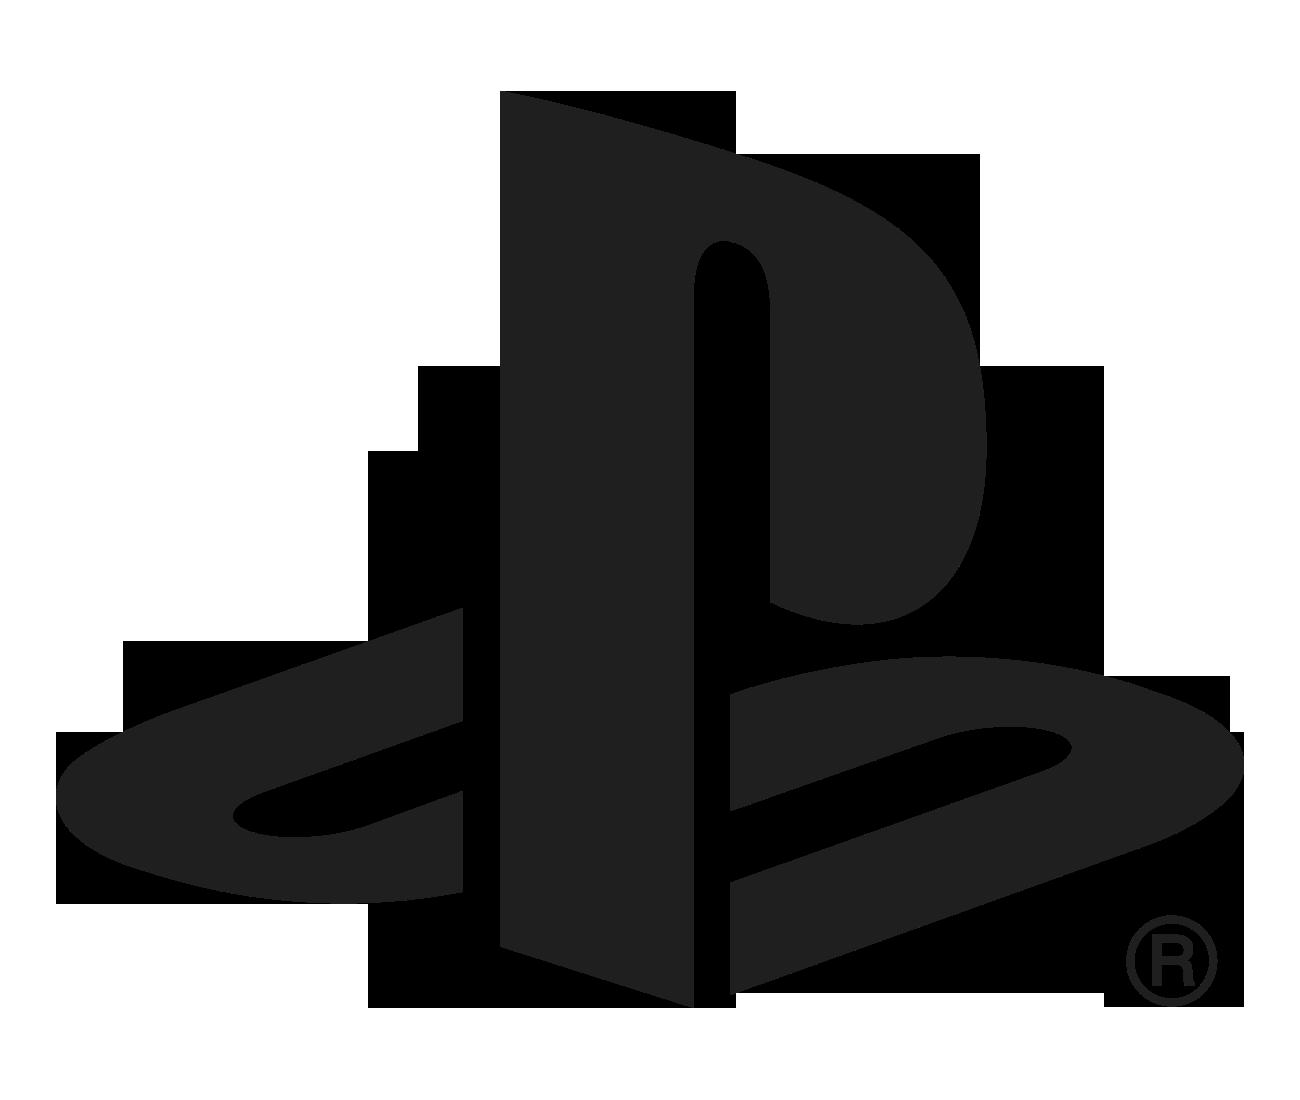 PlayStation Logo, PlayStation Symbol, Meaning, History and ...